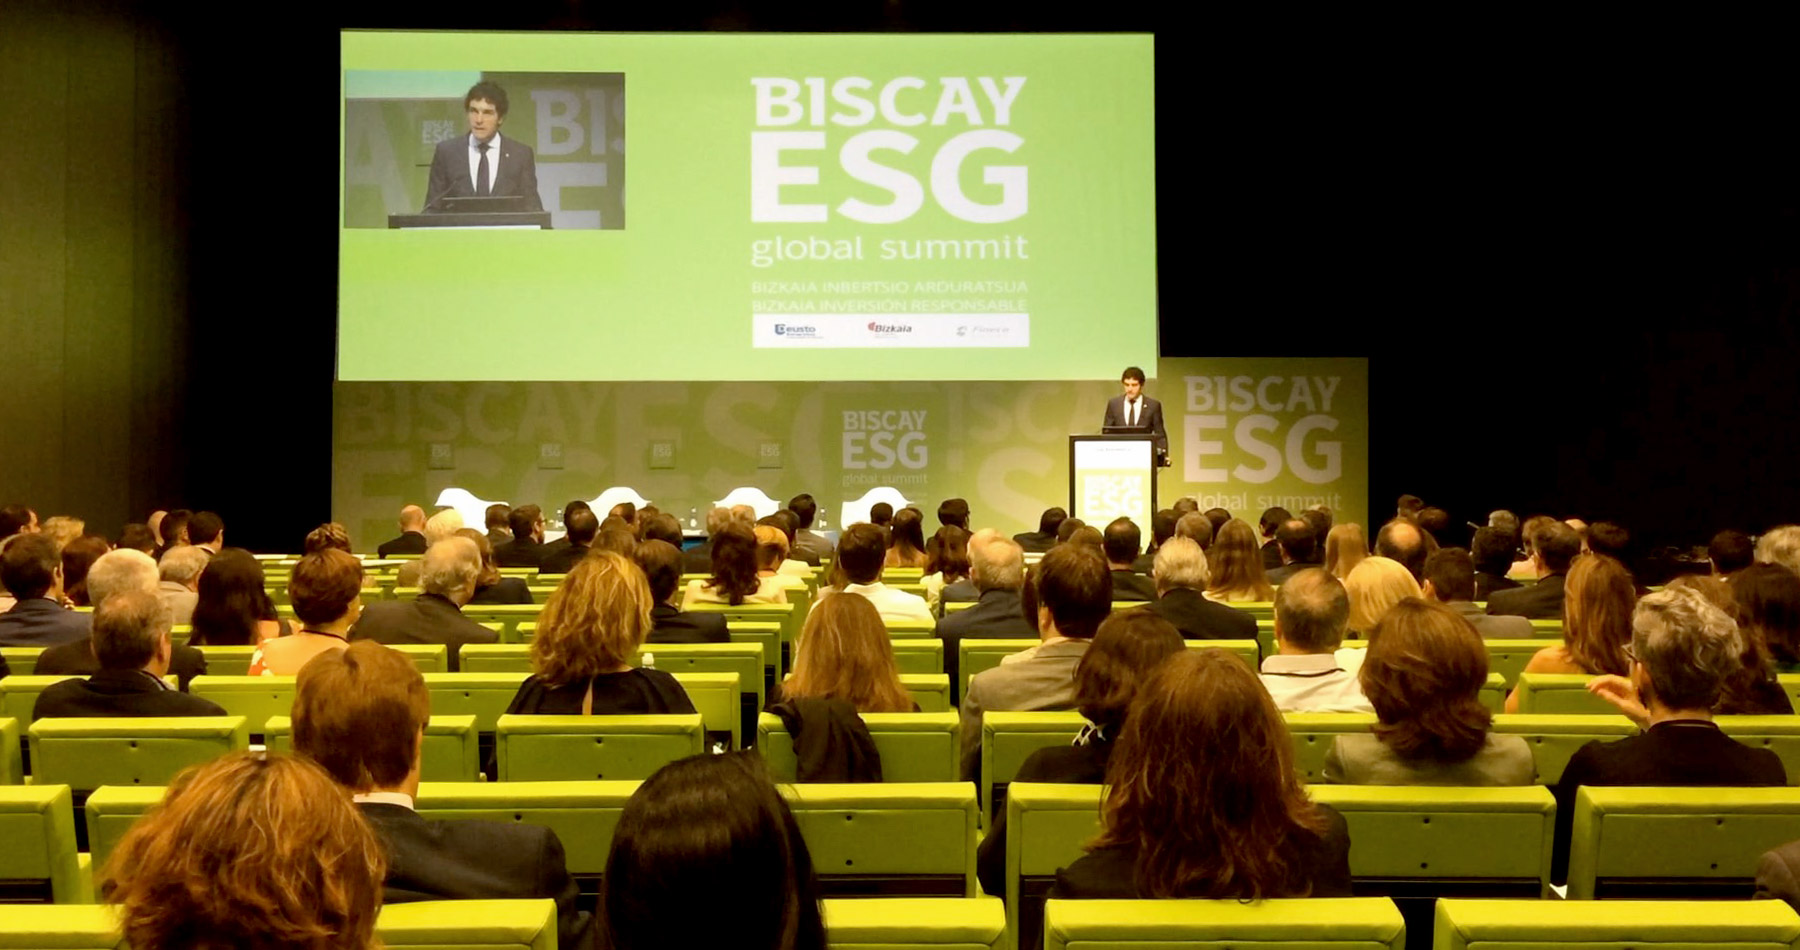 Biscay ESG global summit